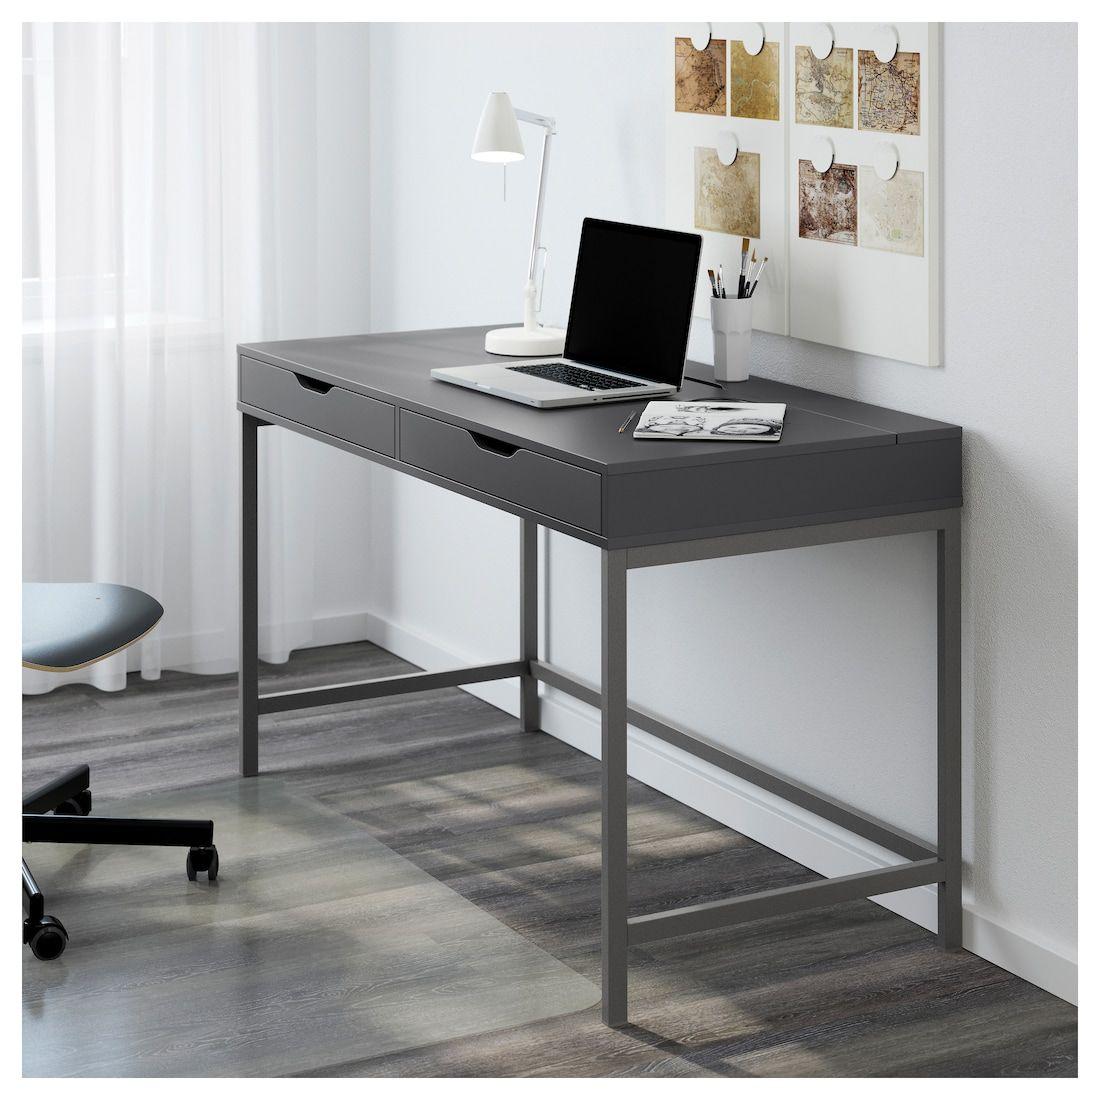 ALEX Desk - gray 51 5/8x23 5/8